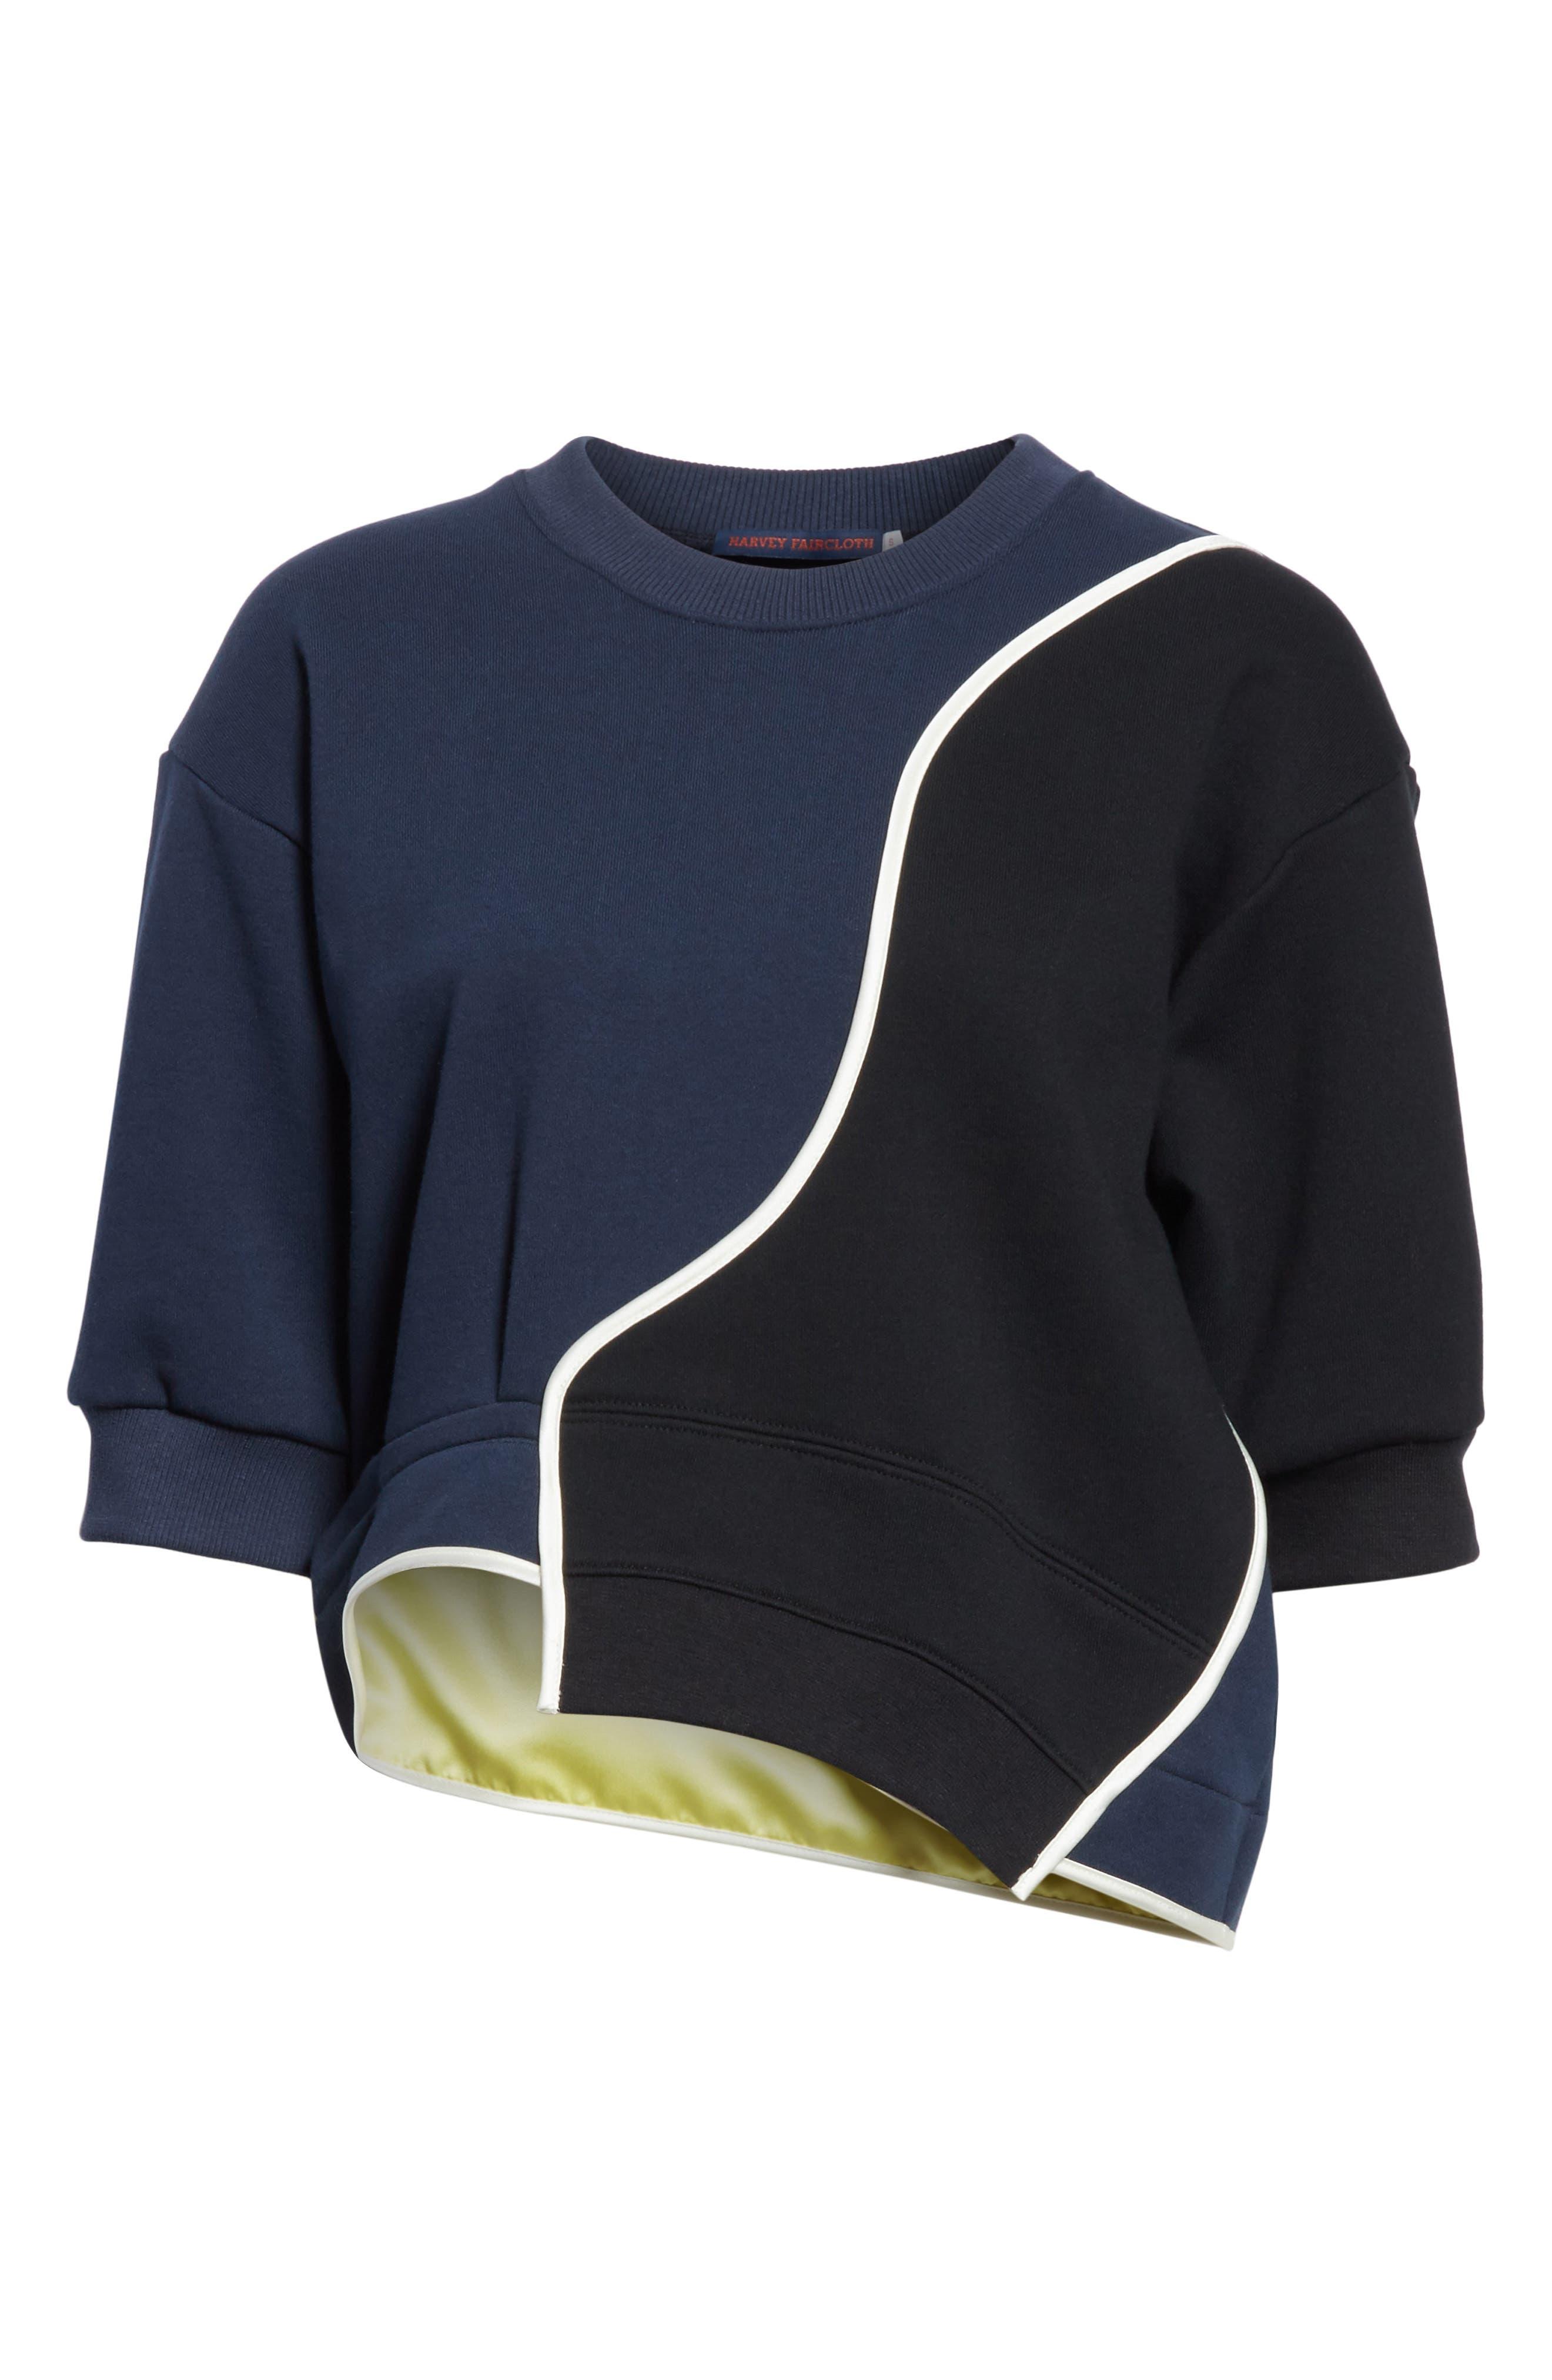 Roberto 03 Colorblock Sweatshirt,                             Alternate thumbnail 6, color,                             Navy